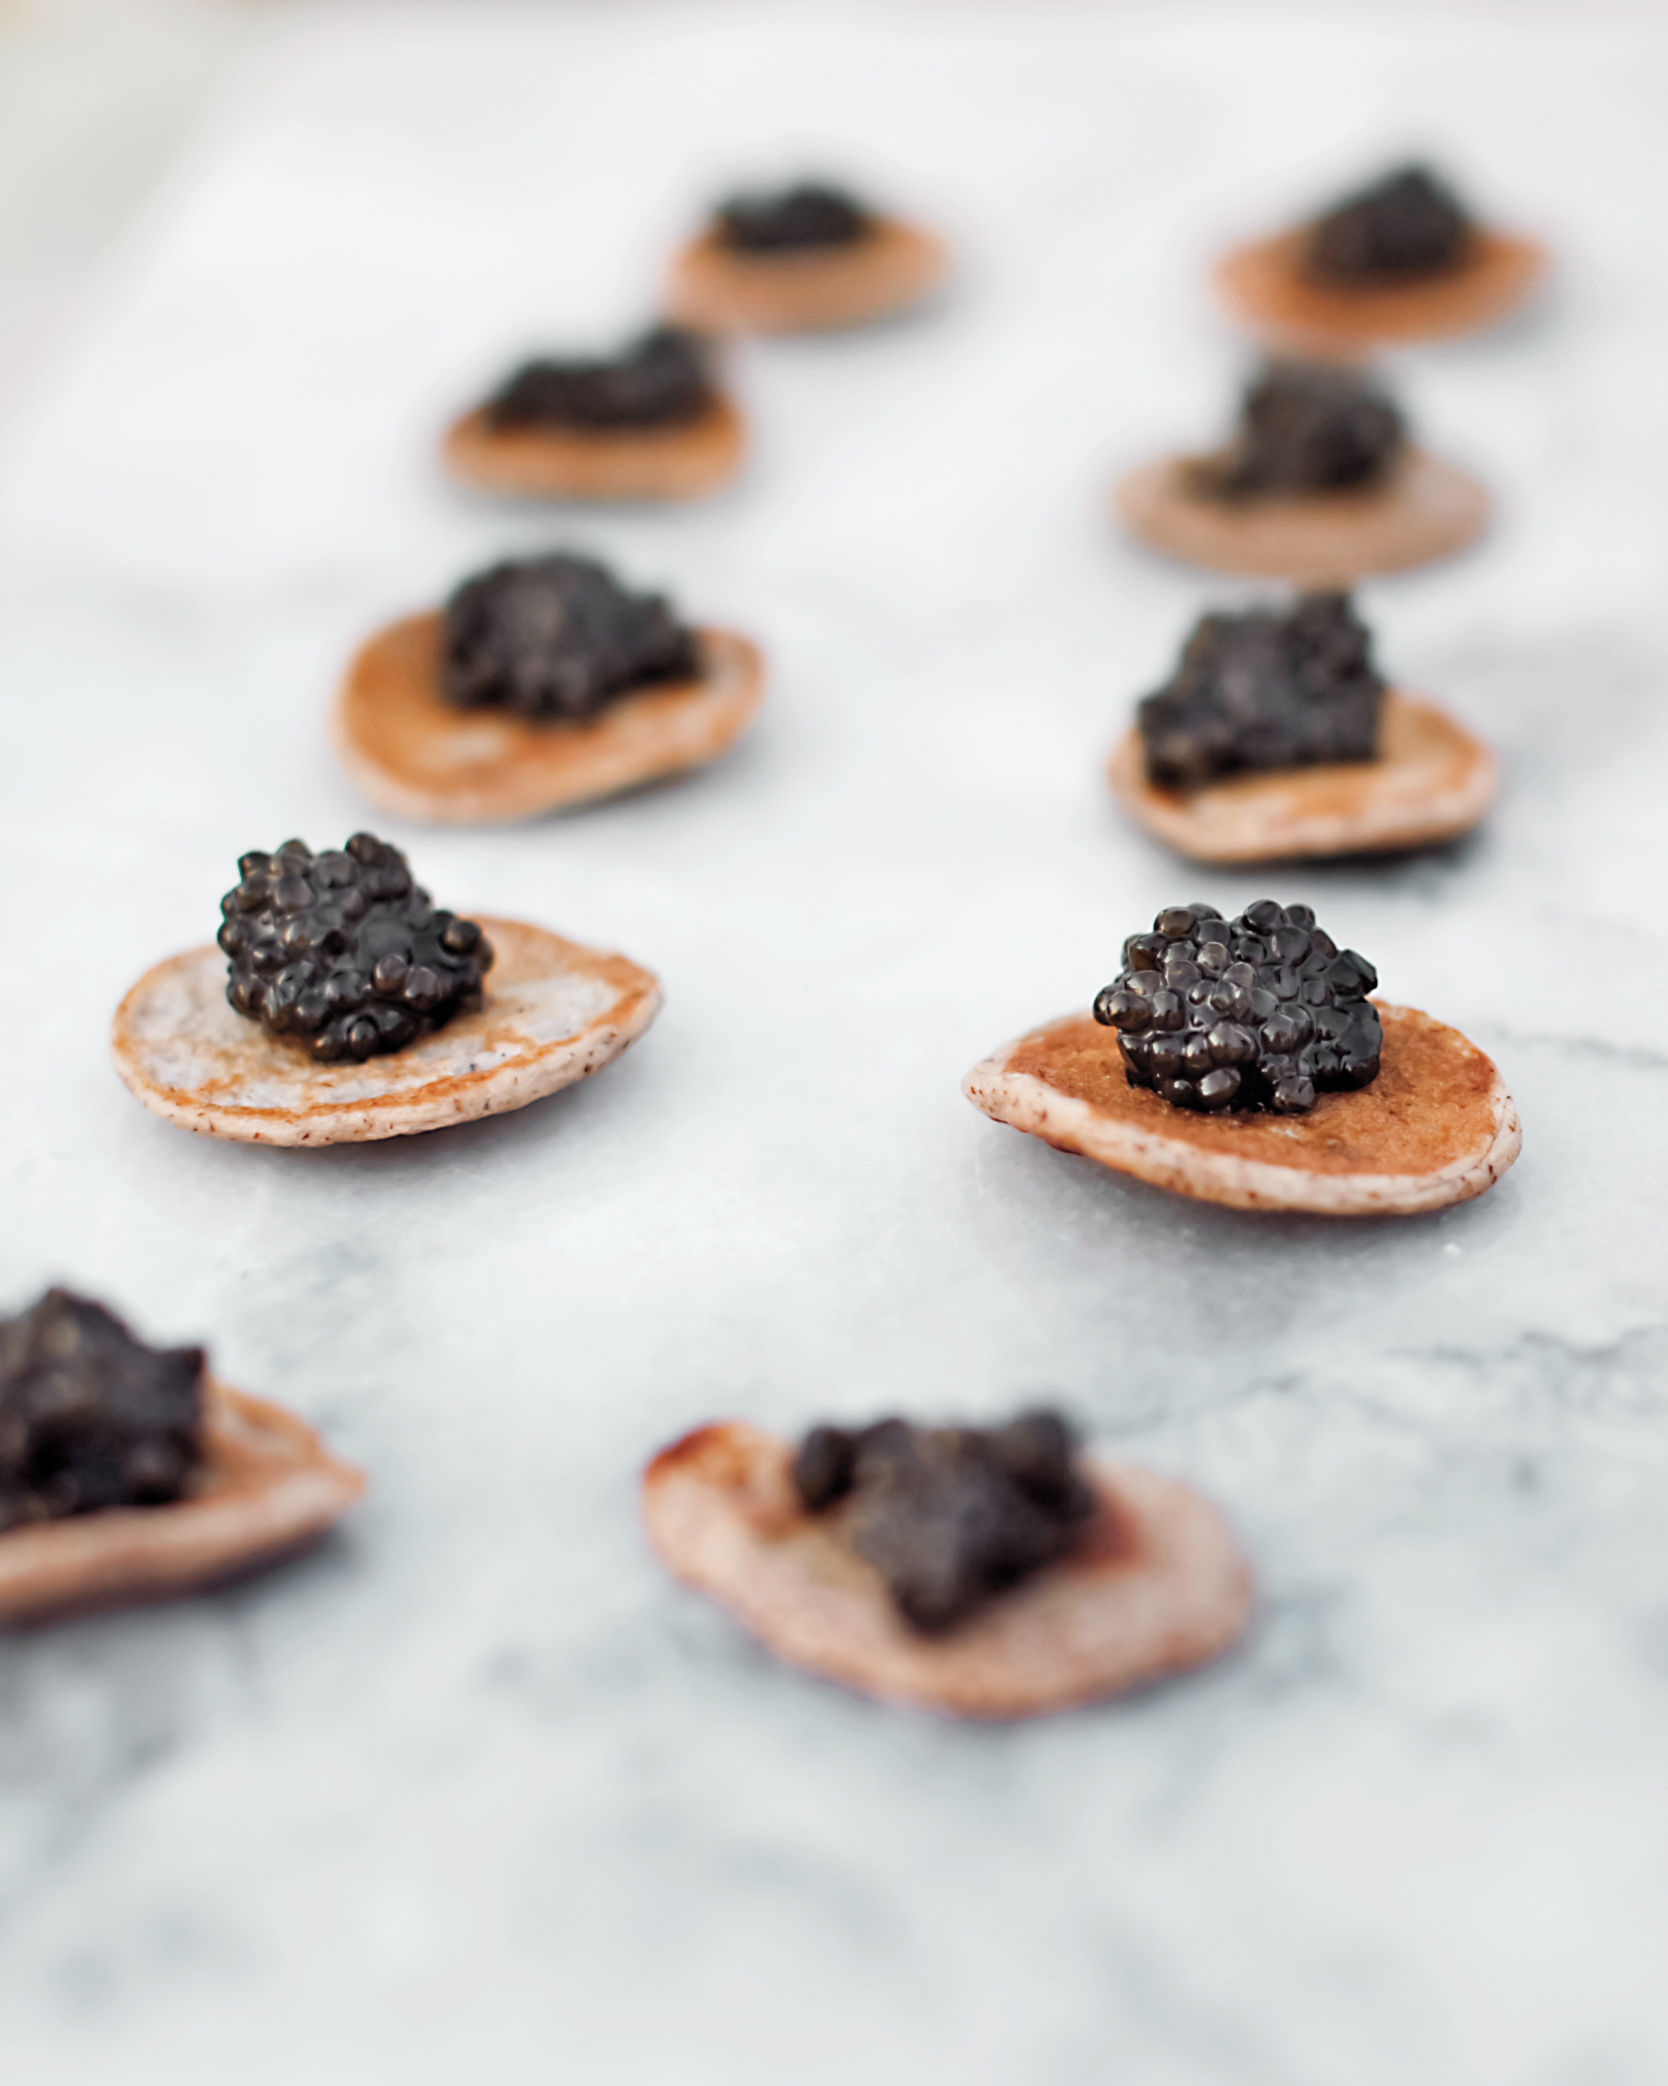 caviar-blini-mwds109981.jpg